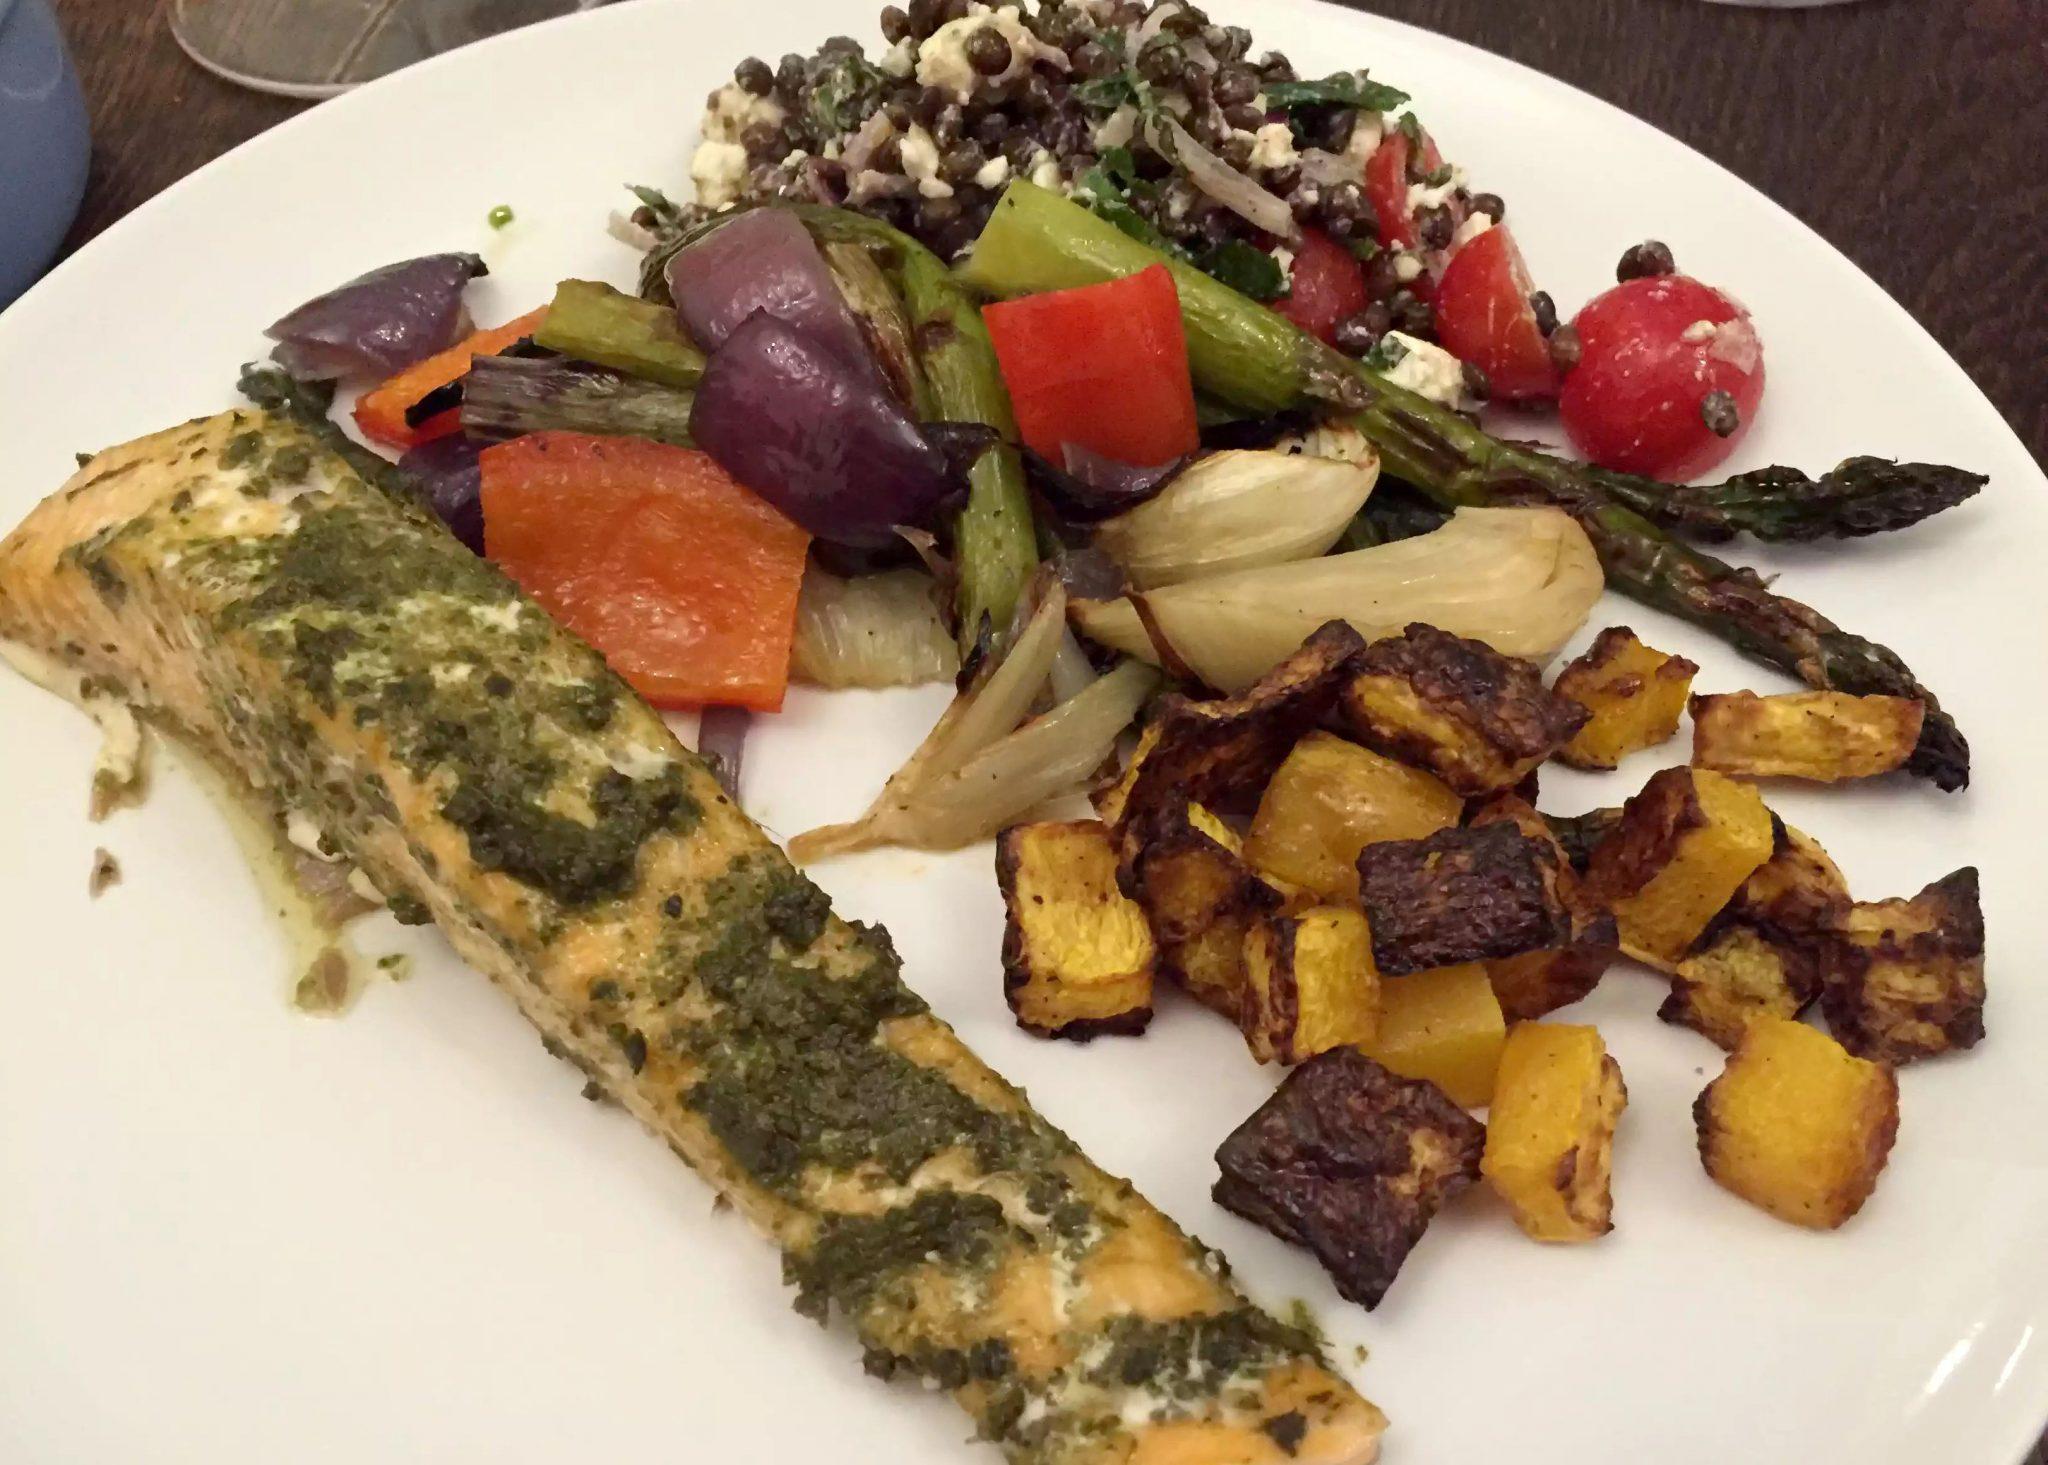 Pesto Salmon Swedes Butternut Squash Roasted Vegetables Recipe lentil Feta Salad